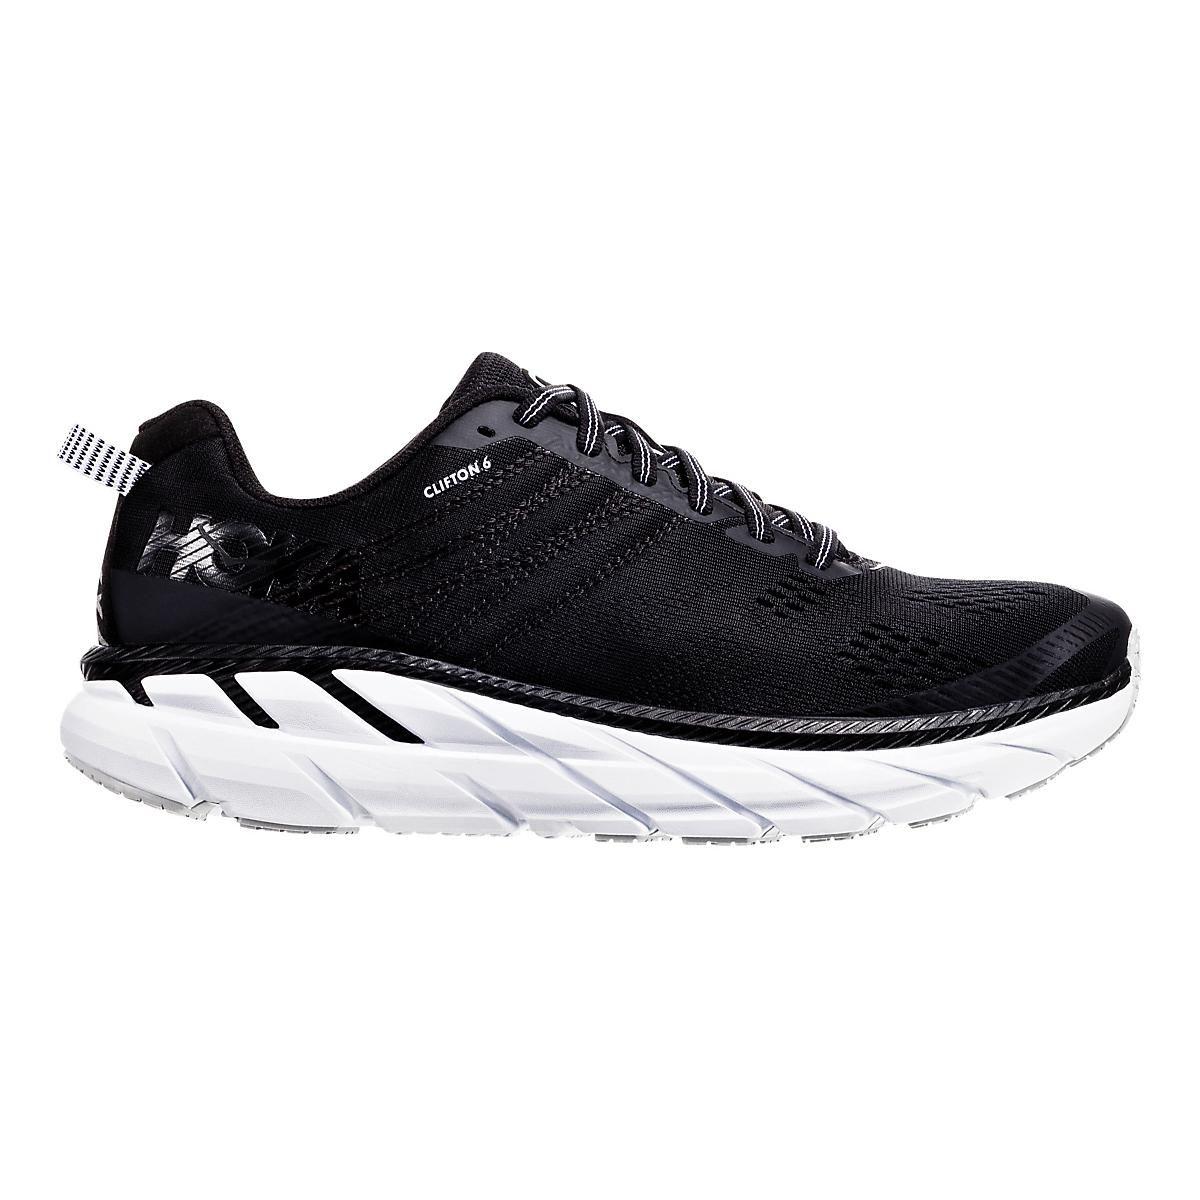 Women's Hoka One One Clifton 6 Running Shoes in 2020